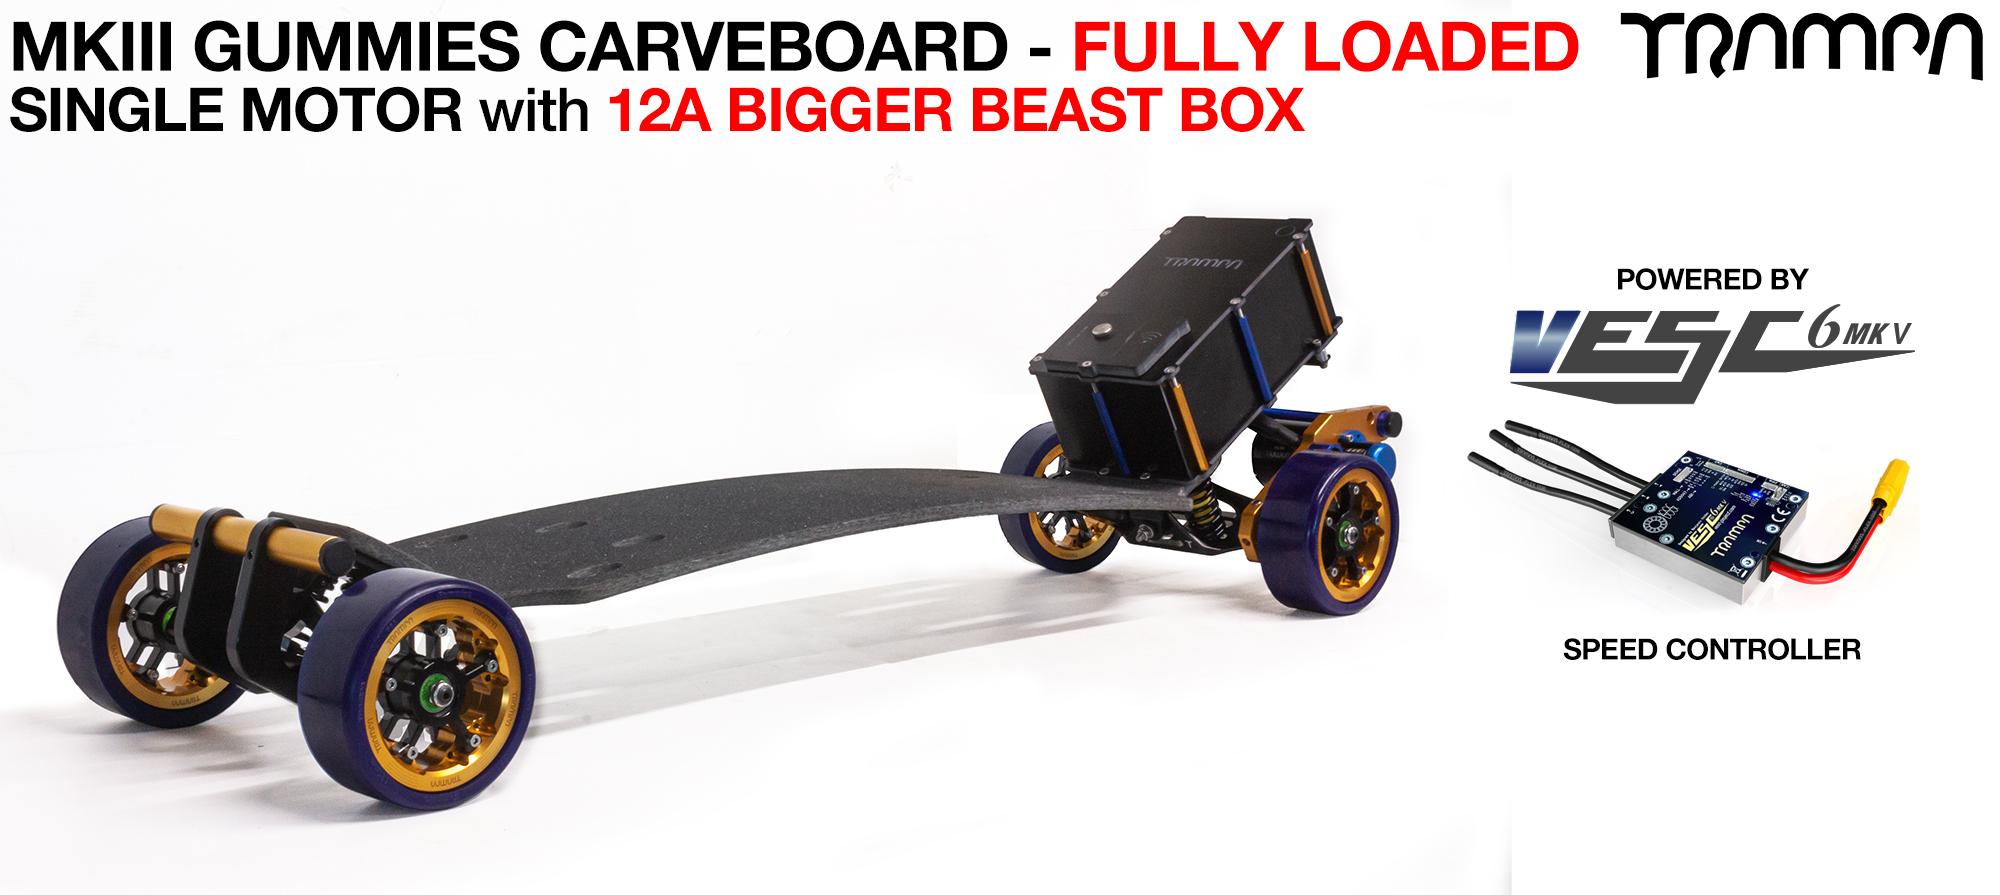 TRAMPA's MkIII Electric GUMMIES Carveboard - uses Mini Spring Trucks with MkIII Carve board Motor Mount,s Custom TRAMPA hubs & 125mm GUMMIES longboard Tyres - SINGLE Motor 12A FULLY LOADED